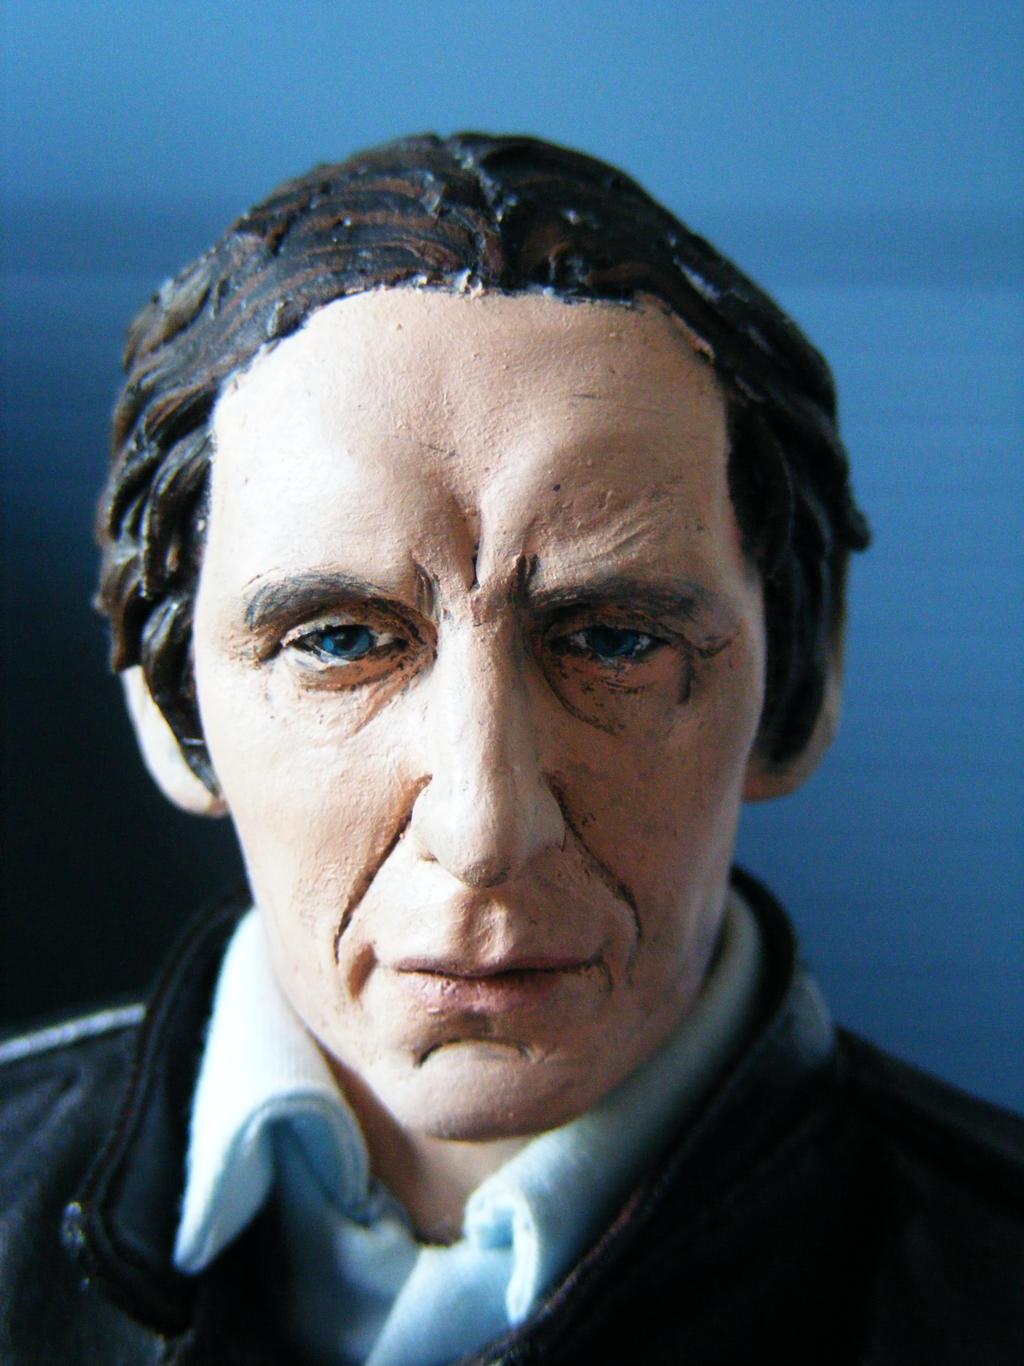 The Eighth Doctor by frasierdalek